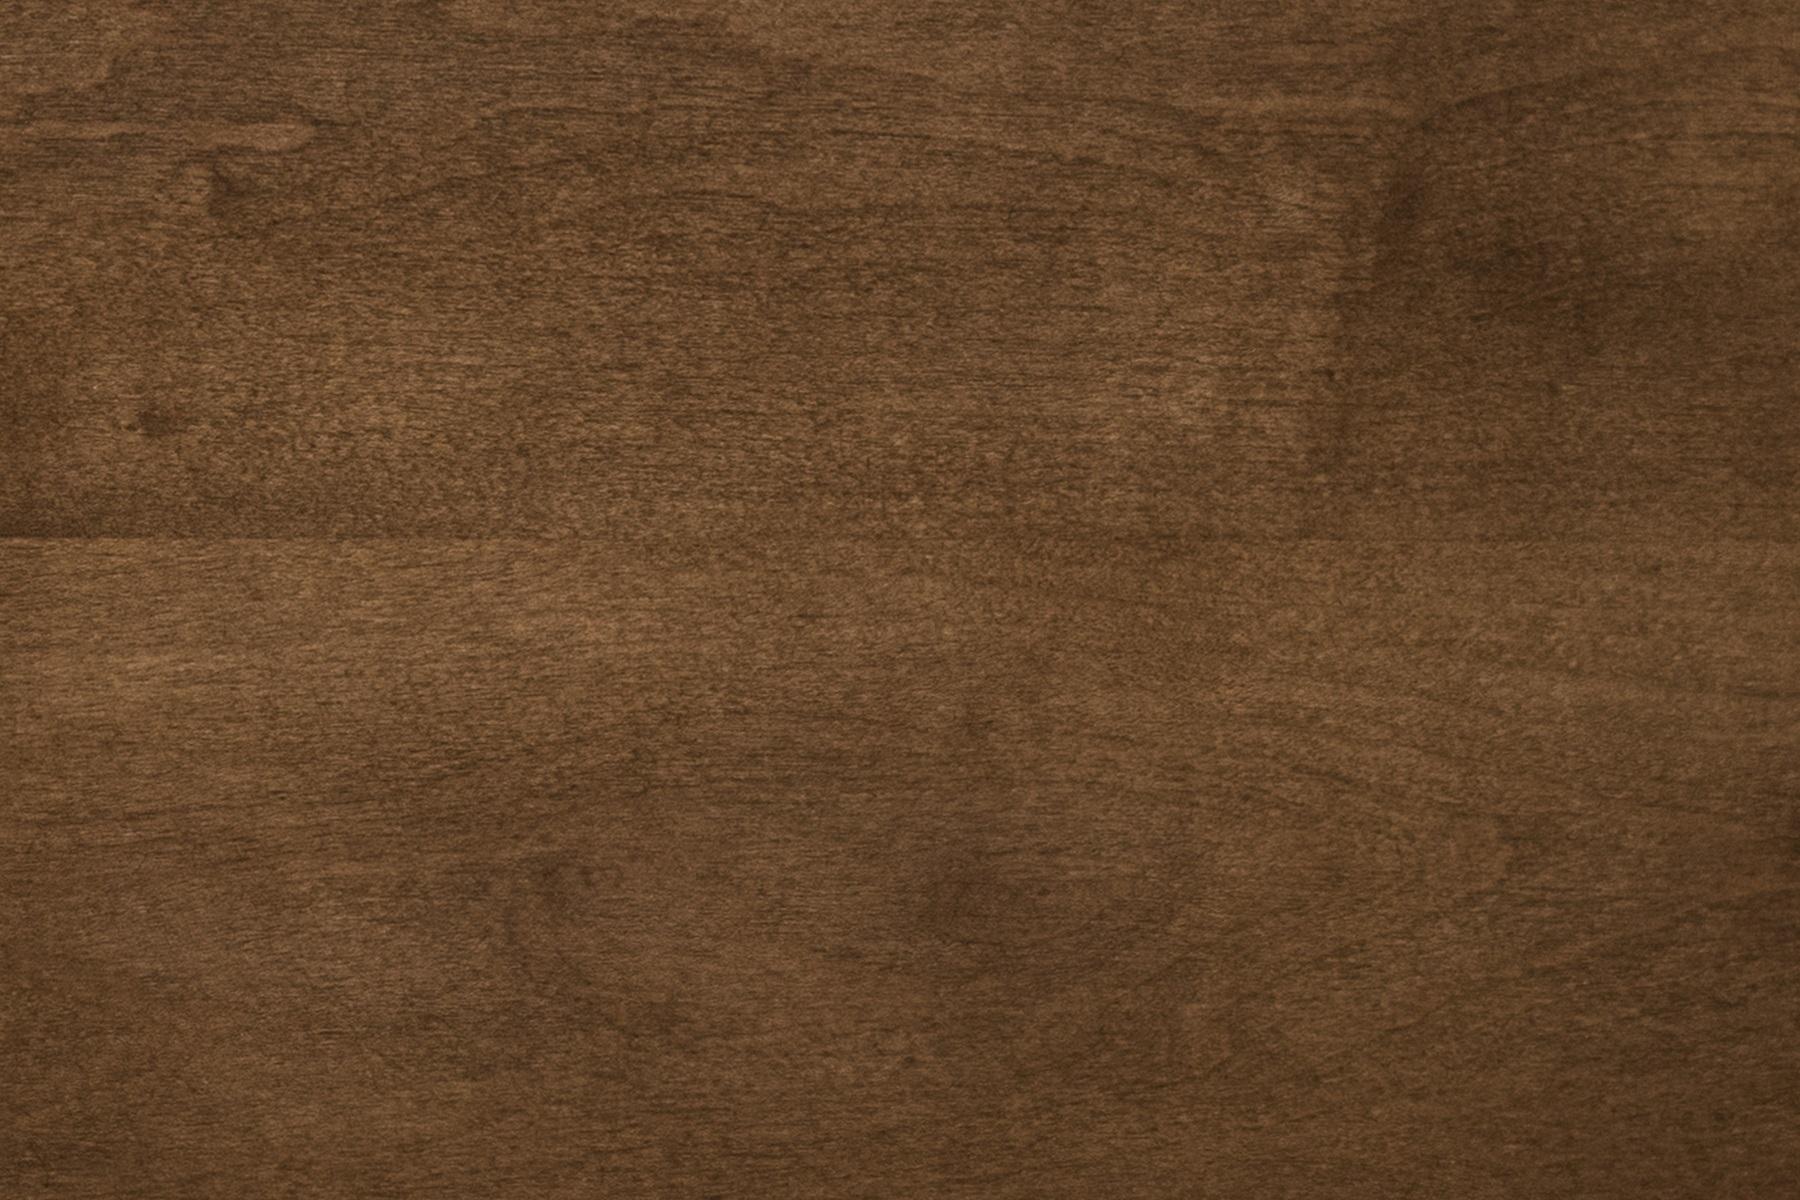 Chestnut - Maple -